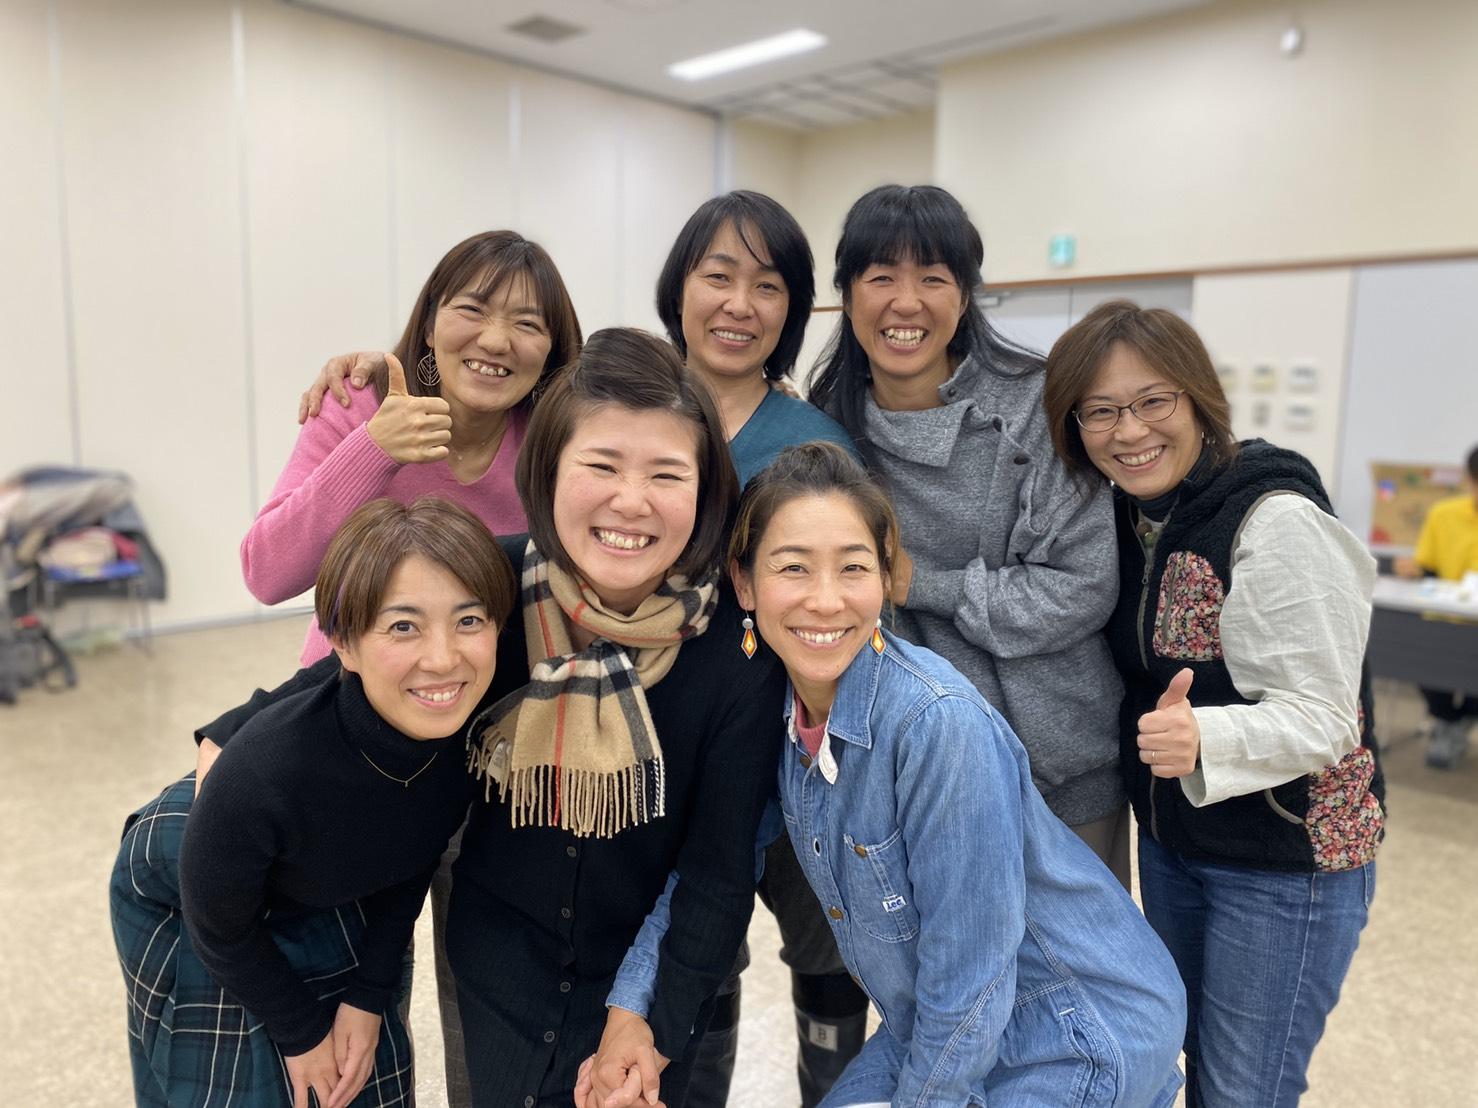 2019/12/17 1010HAPPY藤沢 Bグループ